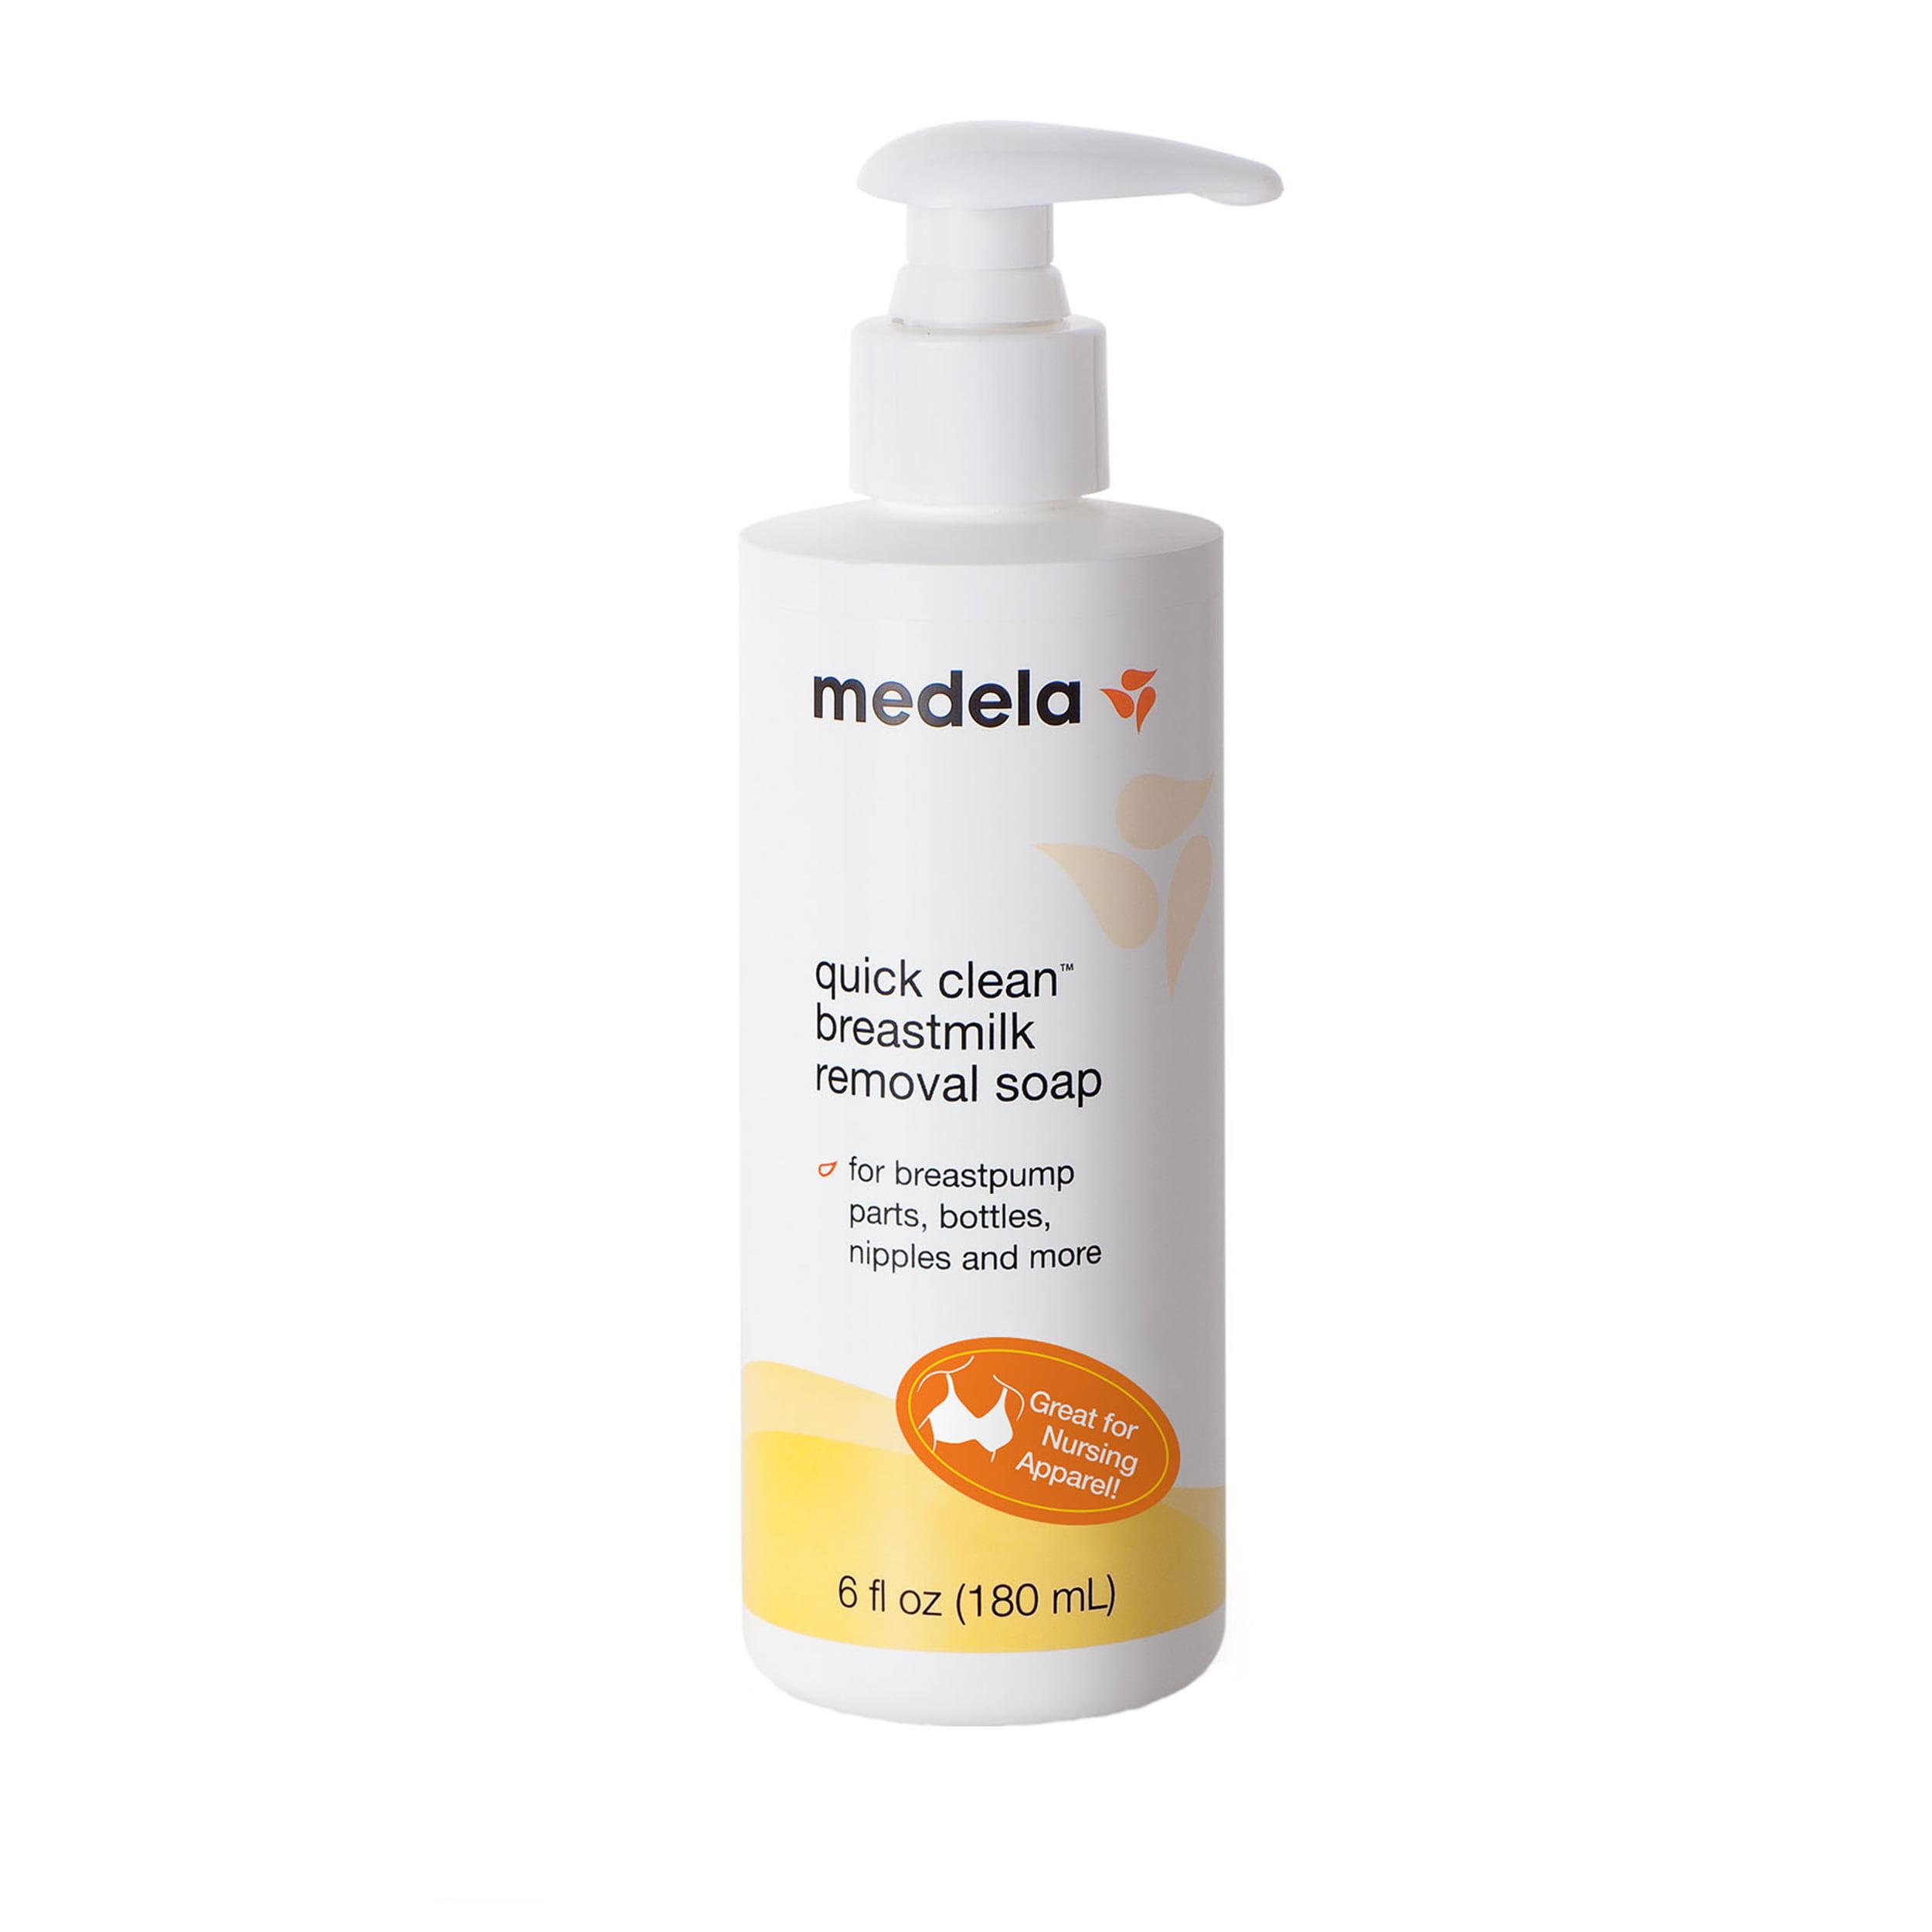 Medela Quick Clean Breastmilk Removal Soap, 6 fl oz